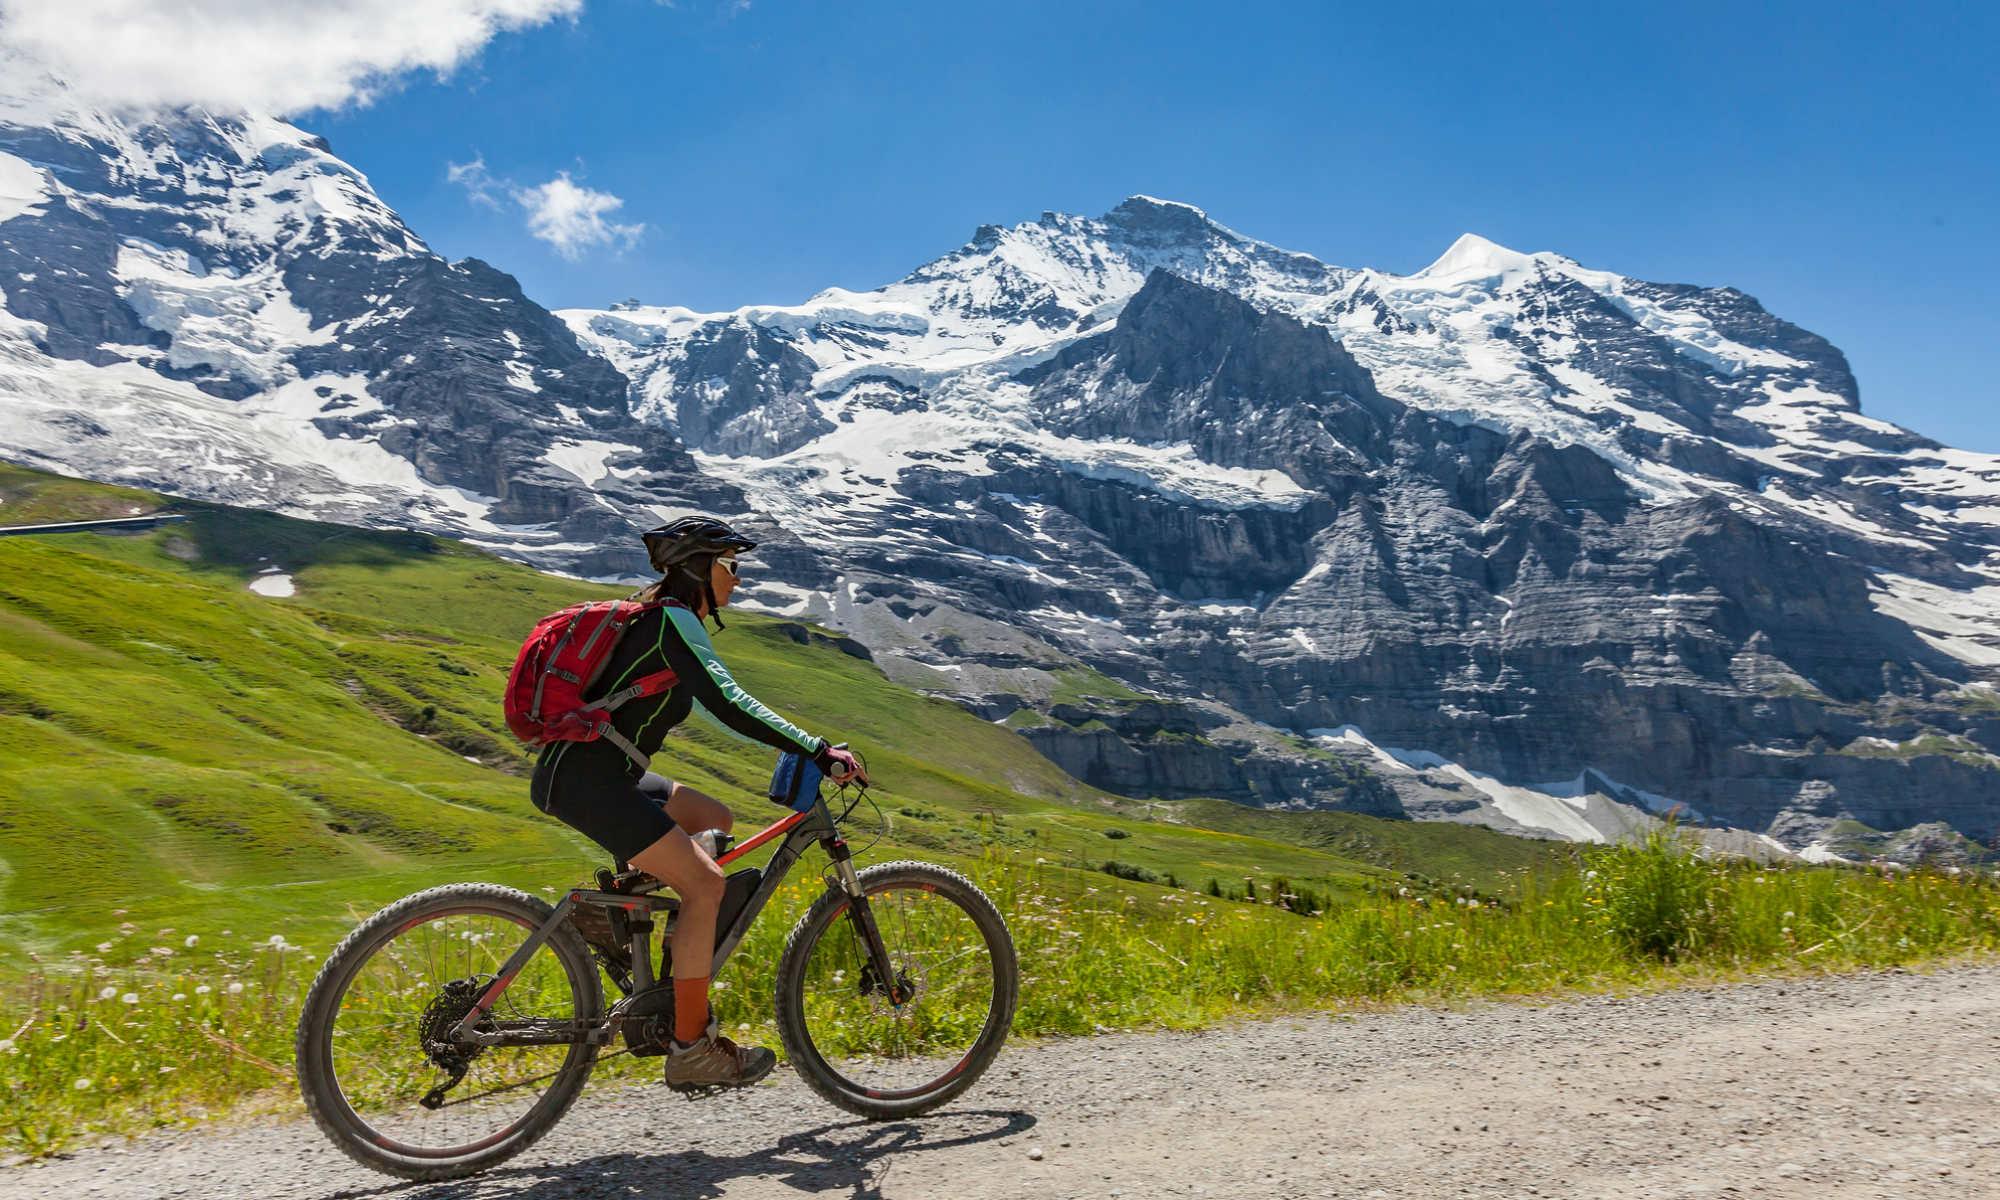 Un ciclista pedala in montagna.